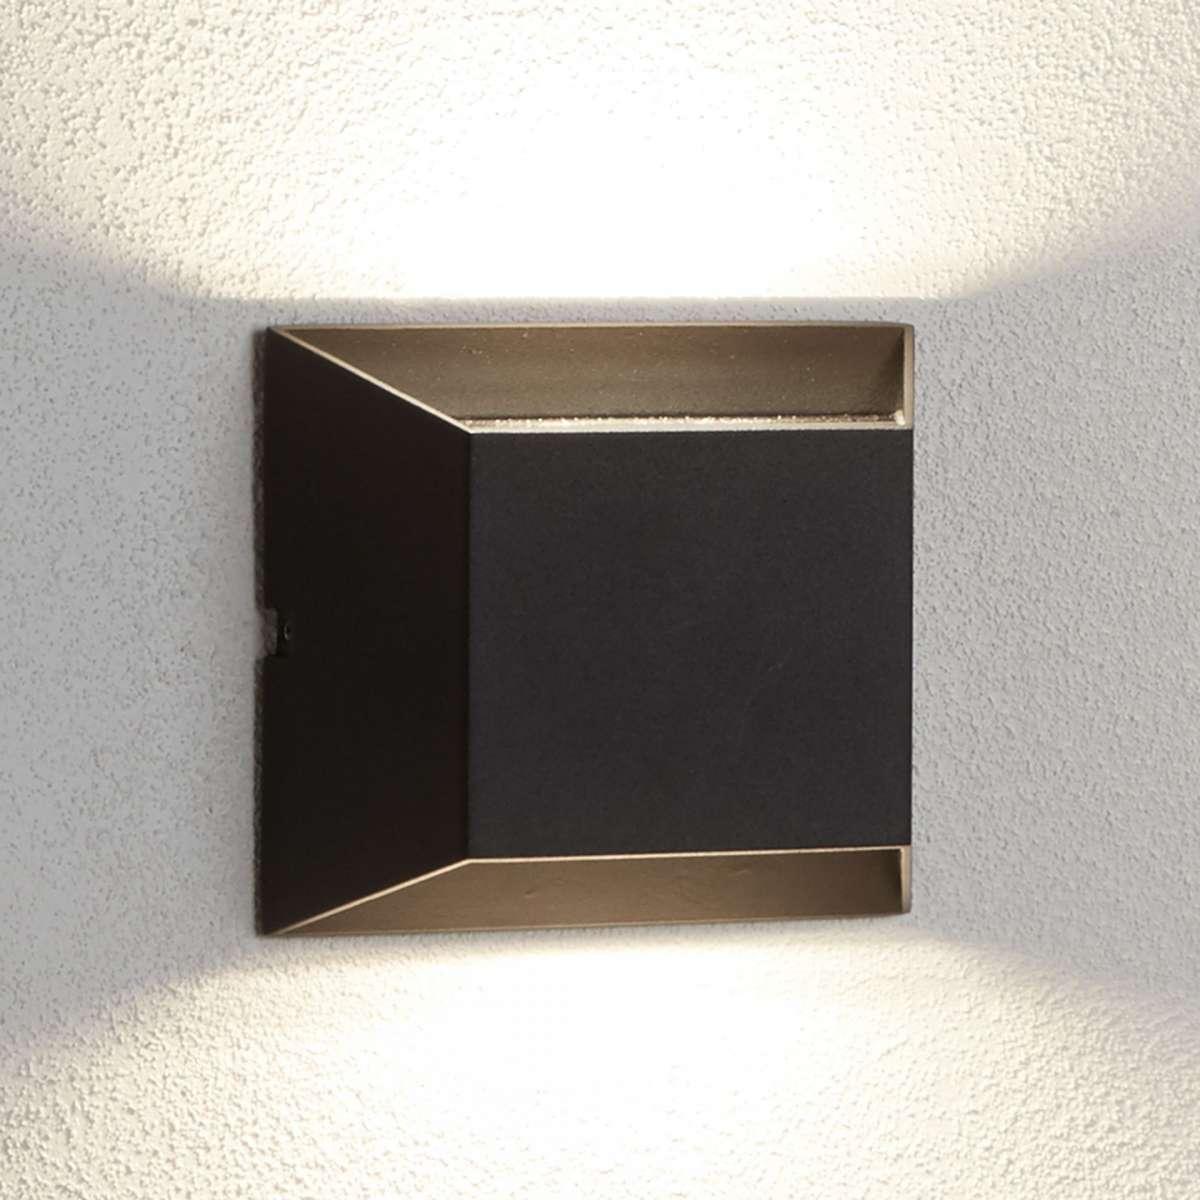 LED Outdoor 2lt Wall Bracket, Black